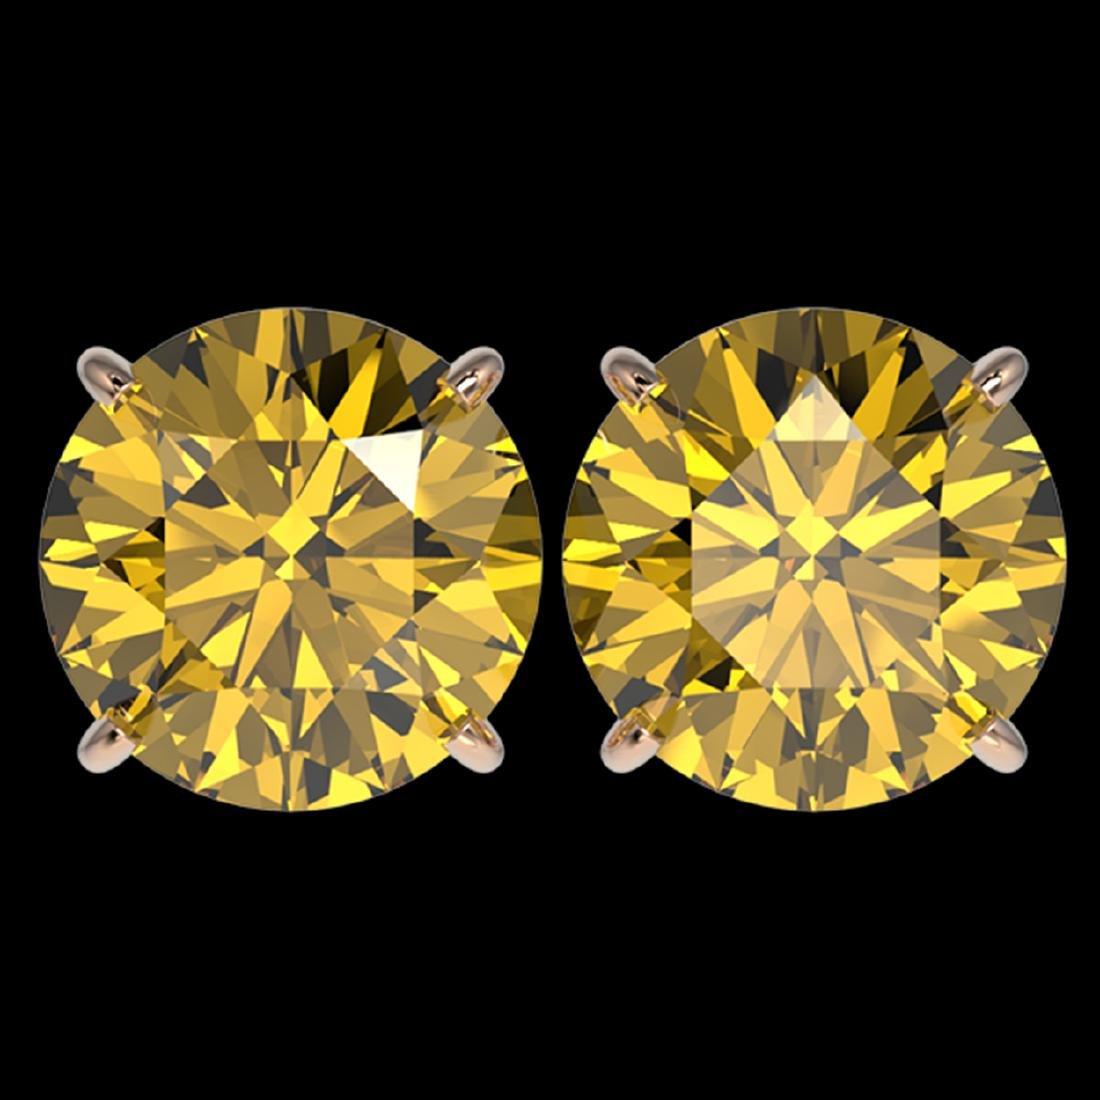 5 ctw Intense Yellow Diamond Stud Earrings 10K Rose